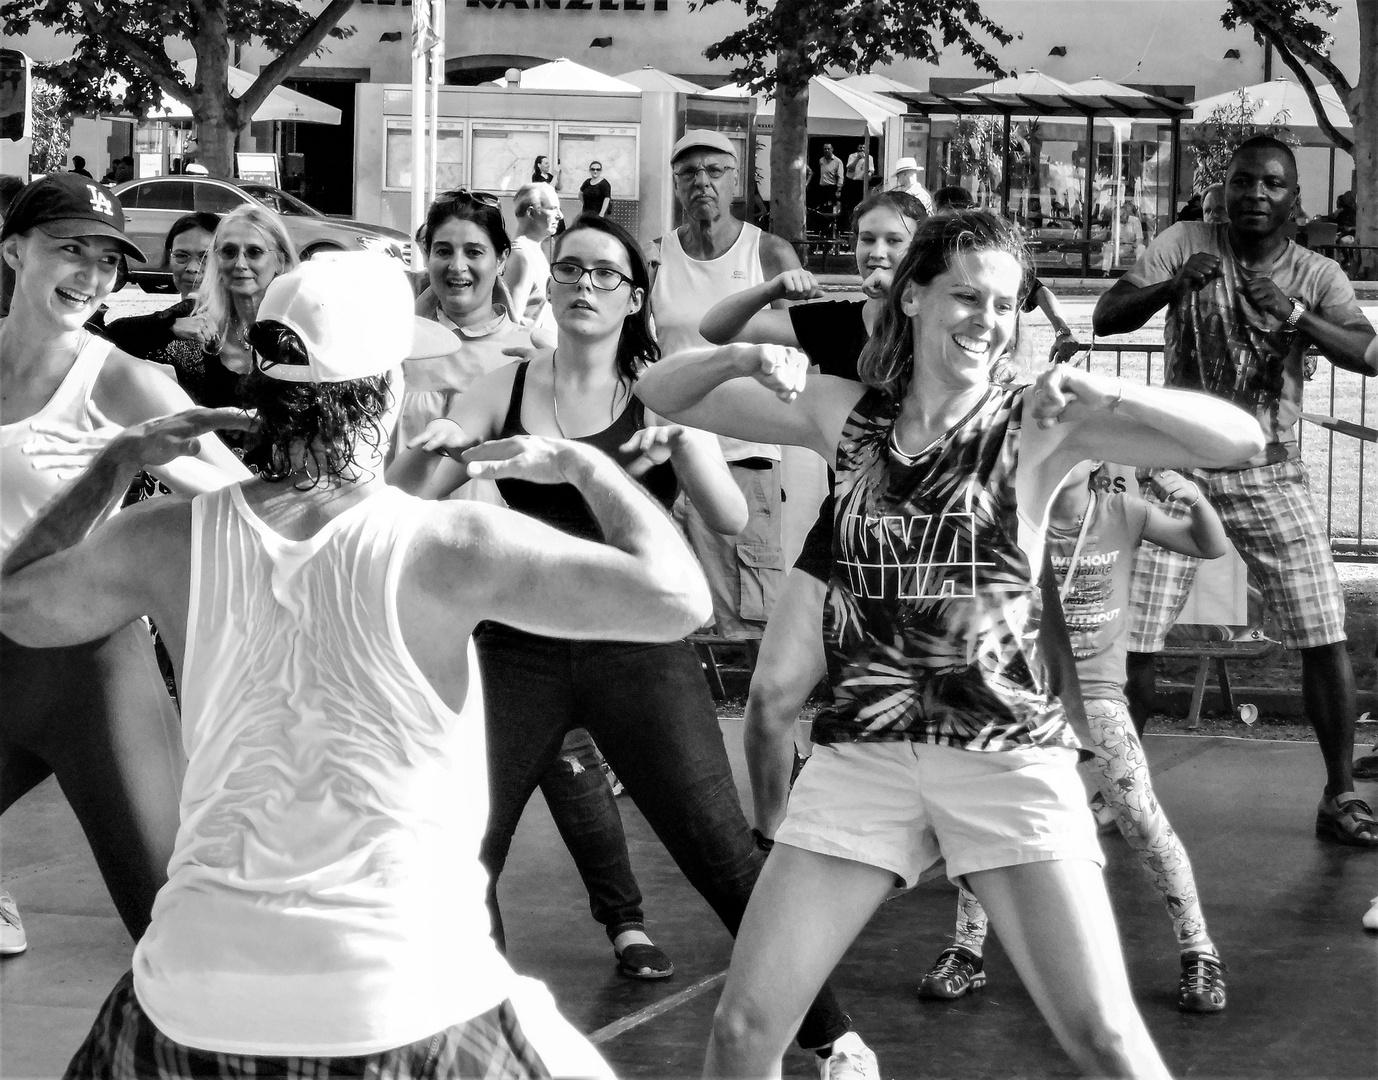 Streetdance Stgt lum-19-42sw +8Fotos